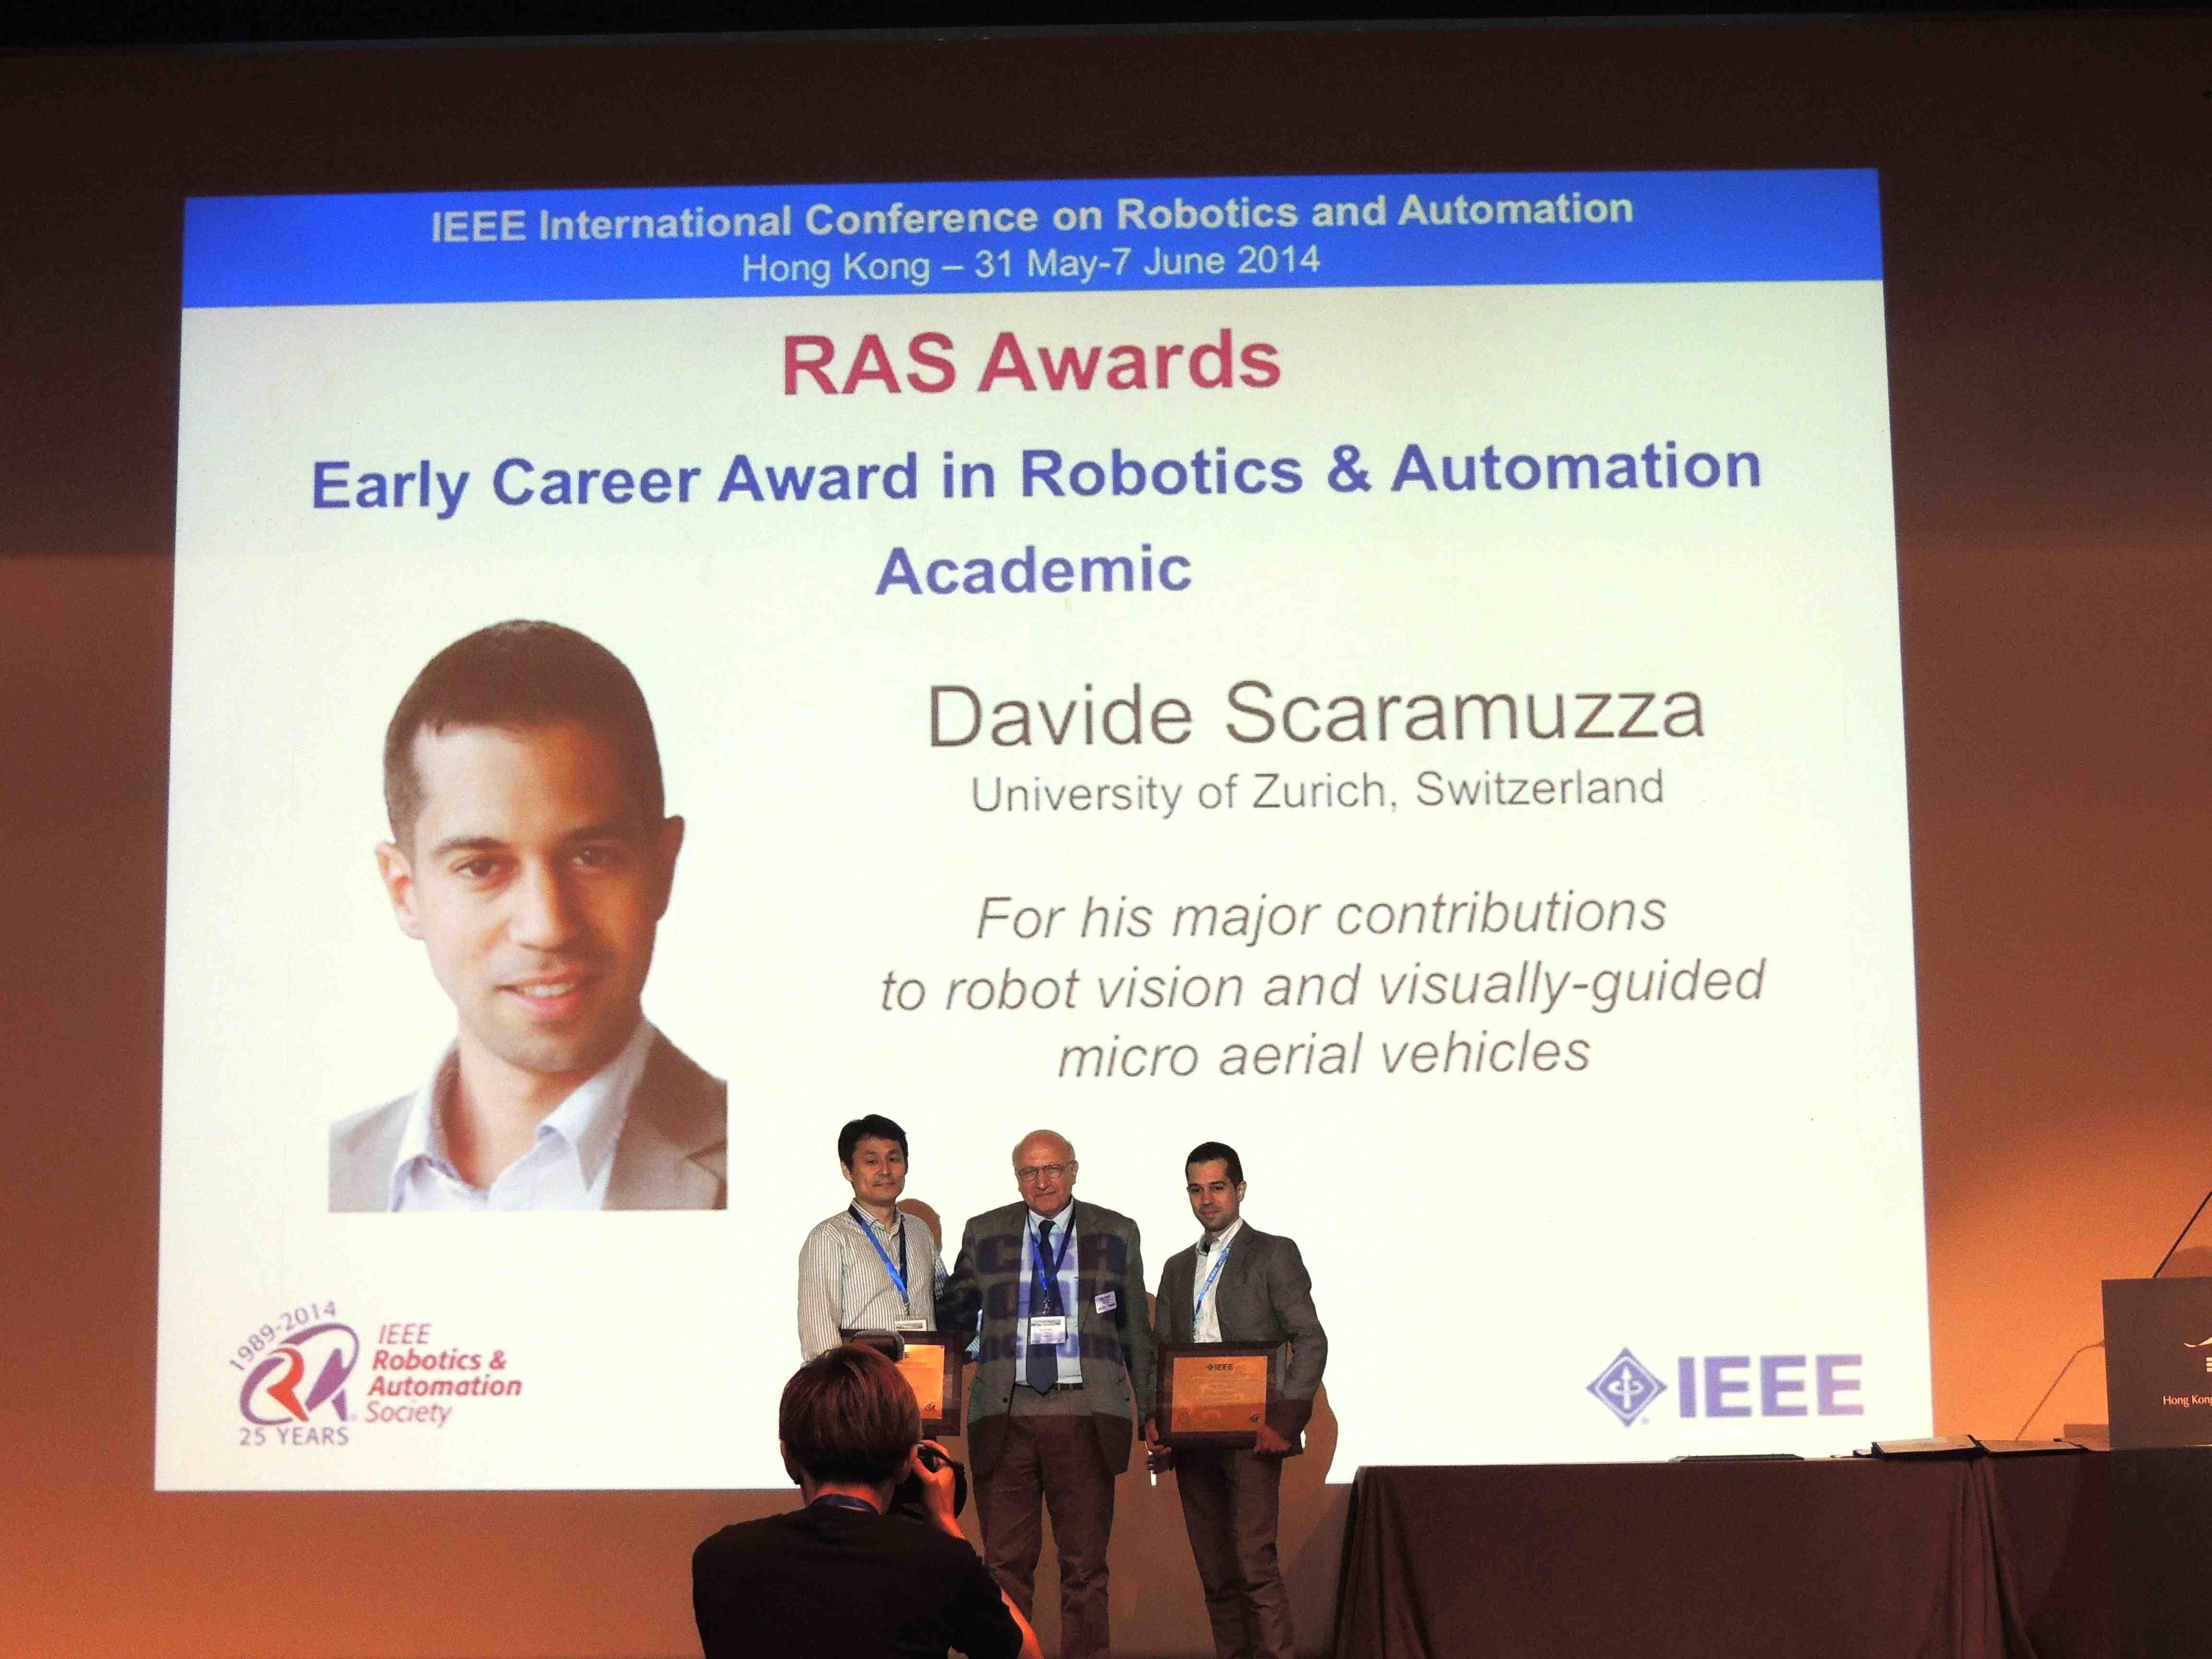 Uzh Robotics And Perception Group Davide Scaramuzza Wins Ieee